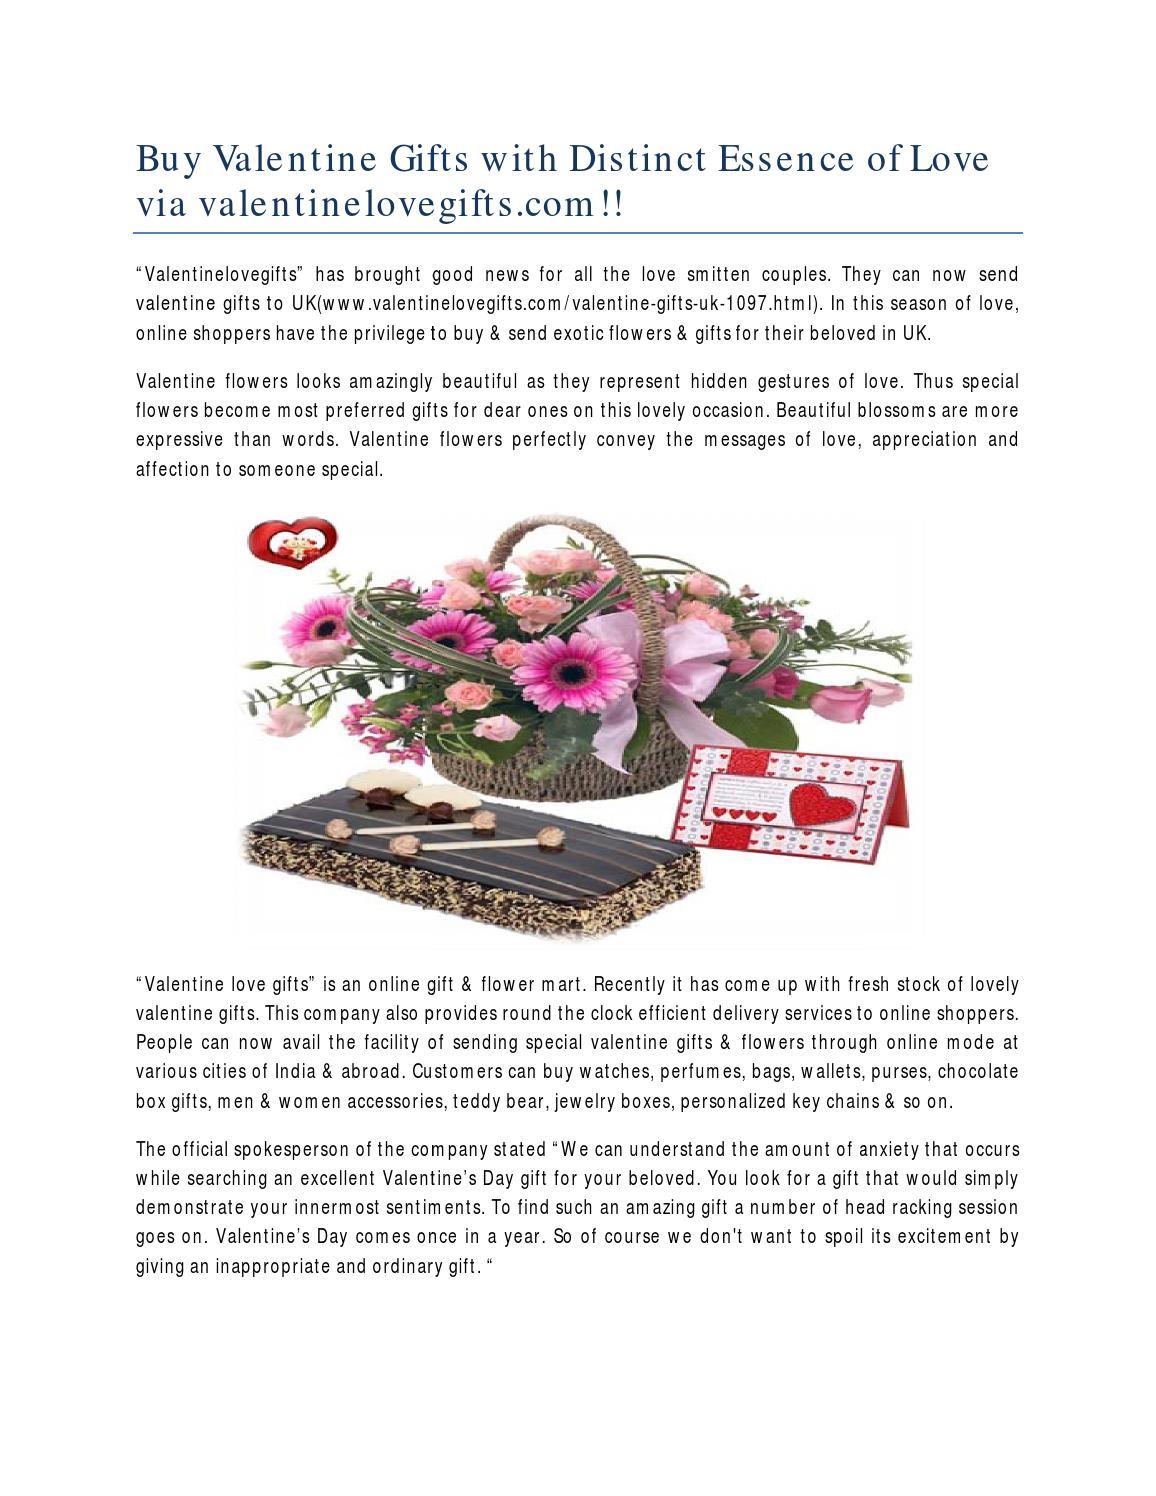 Buy Valentine Gifts With Distinct Essence Of Love Via